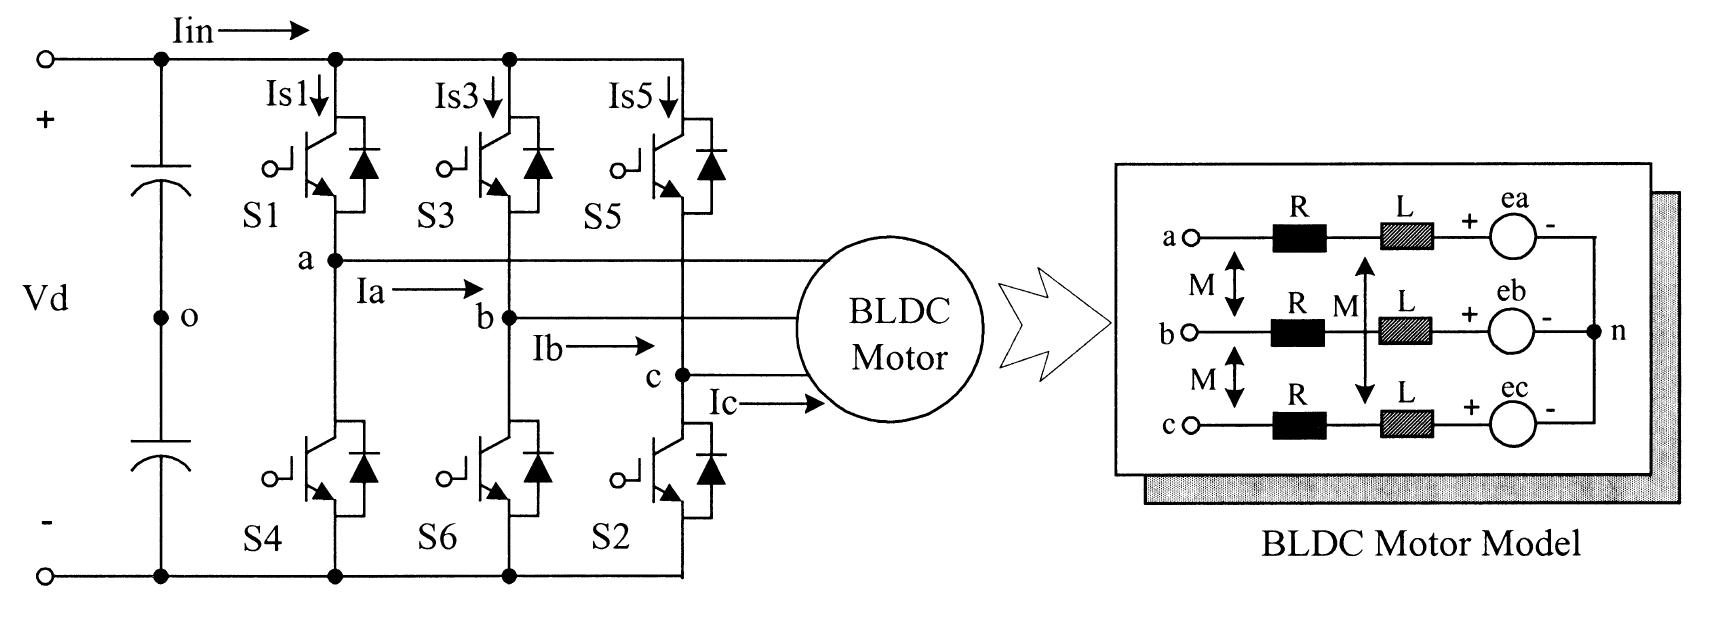 hight resolution of 3 phase inverter bldcm png147 68 kb